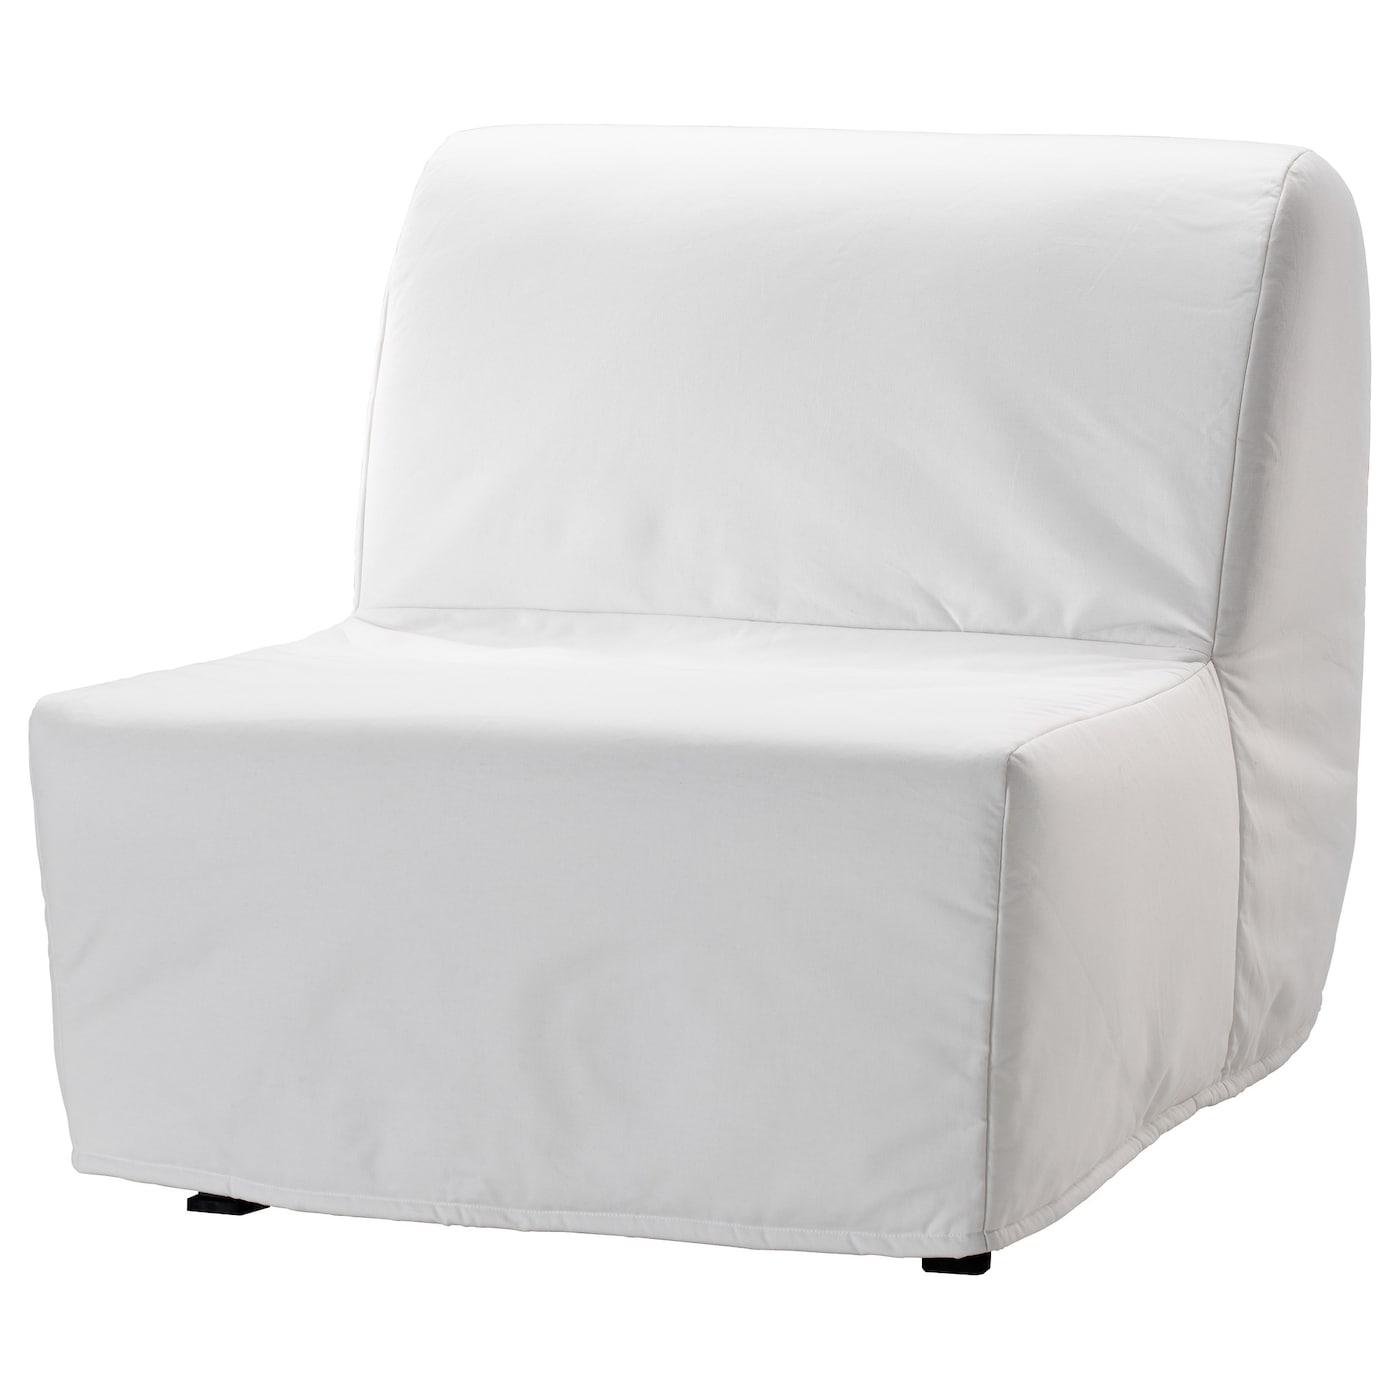 Lycksele LÖvÅs Chair Bed Ransta White